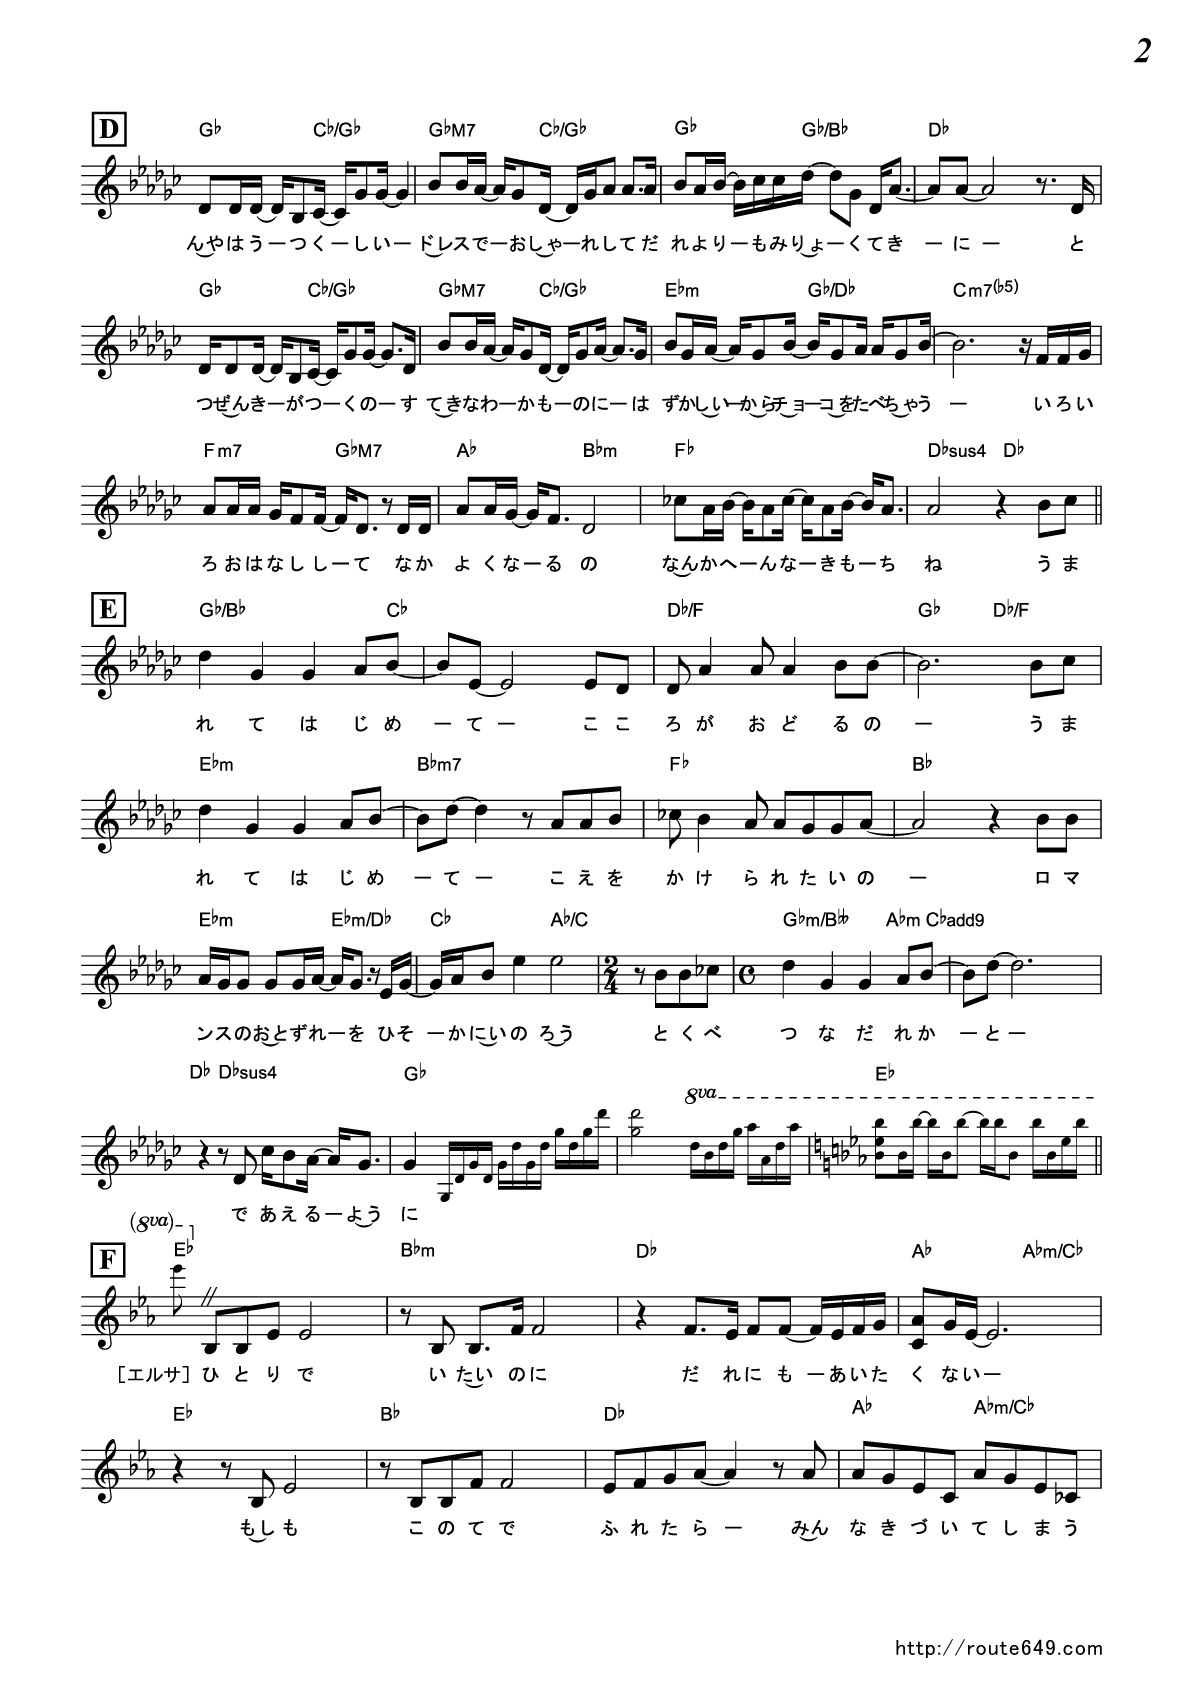 アナと雪の女王 楽譜 無料